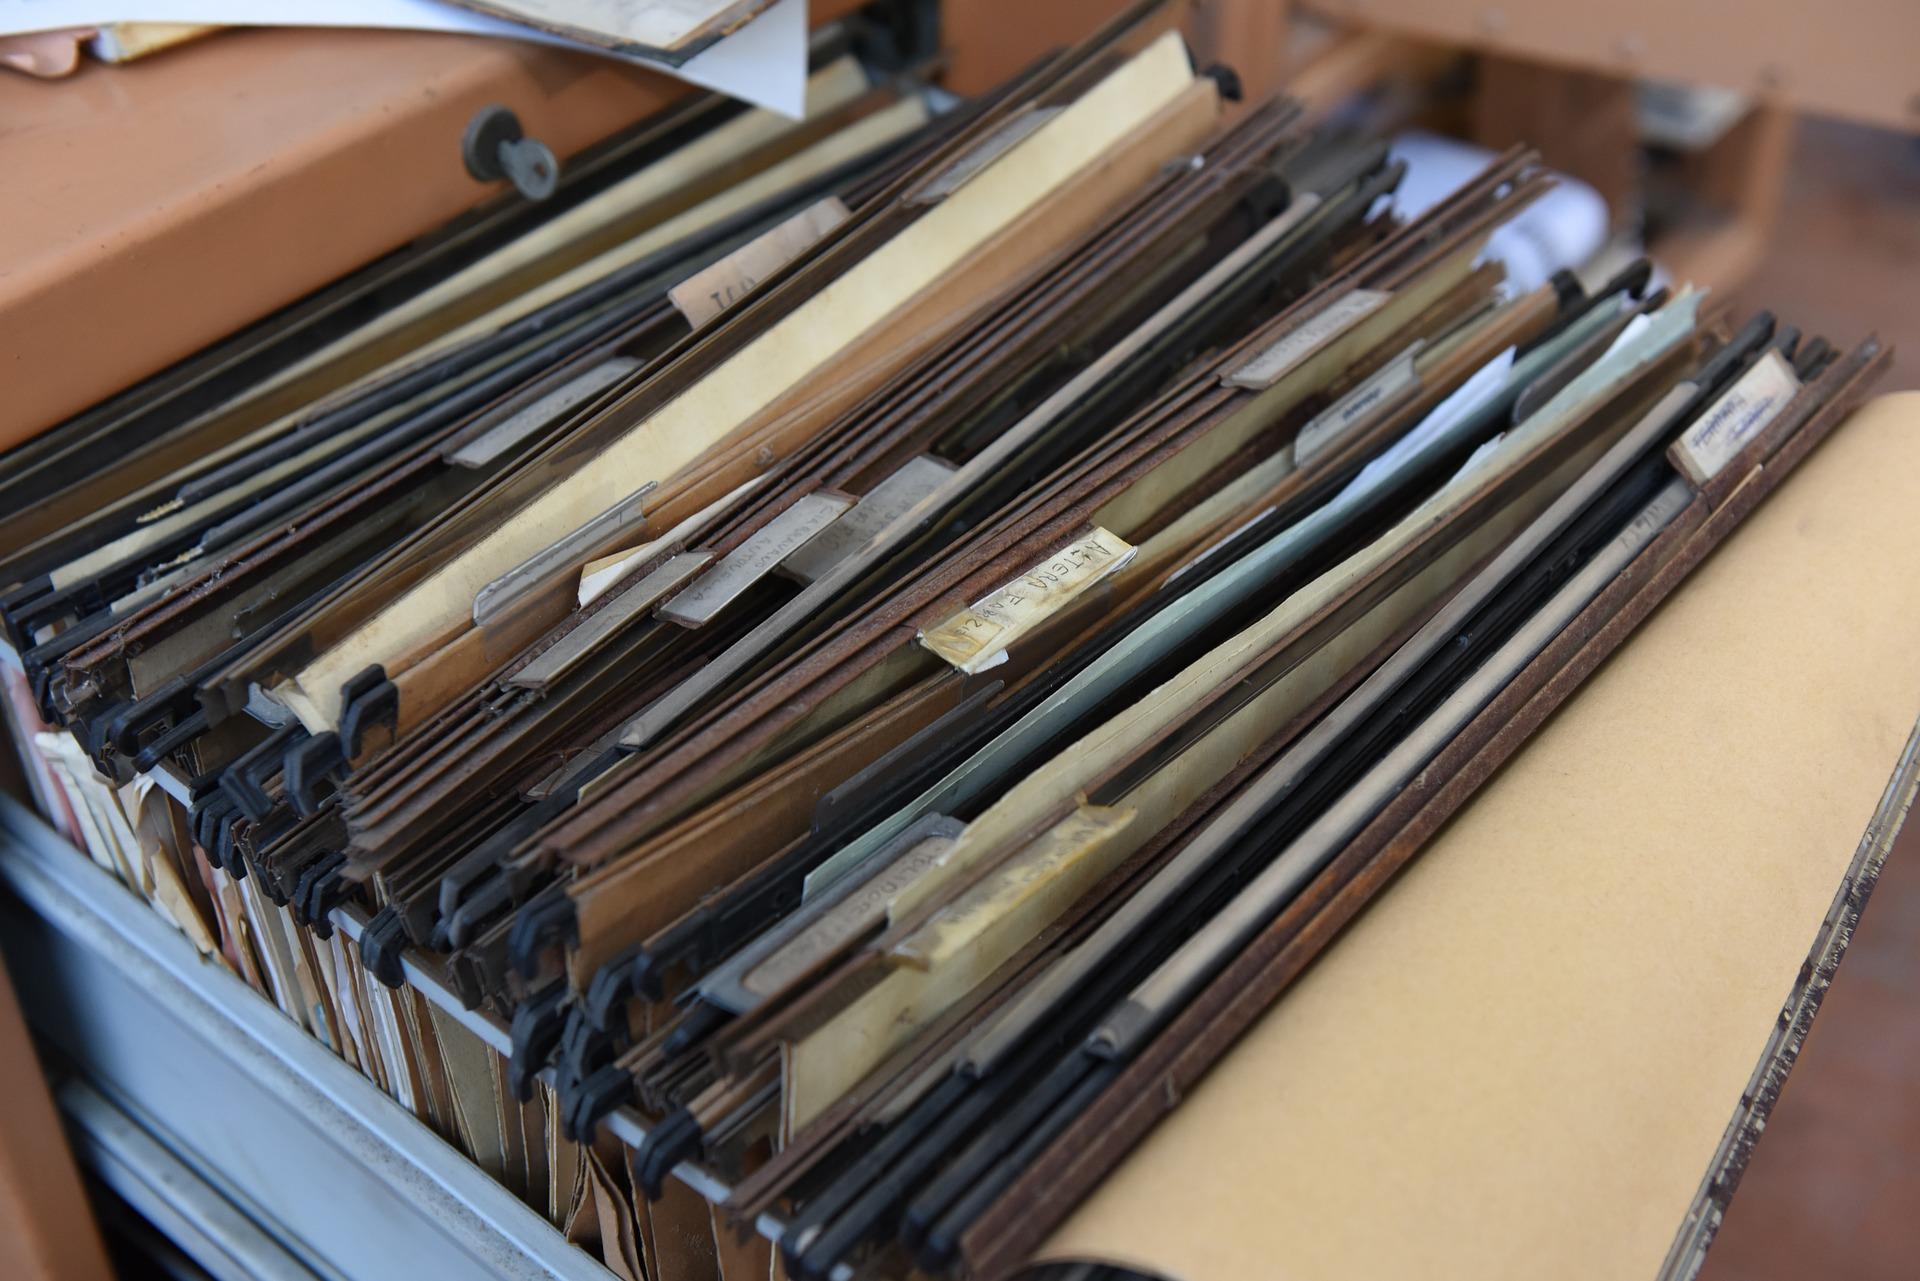 Ecodesign & Energy Labelling Package – strengths & weaknesses of each measure